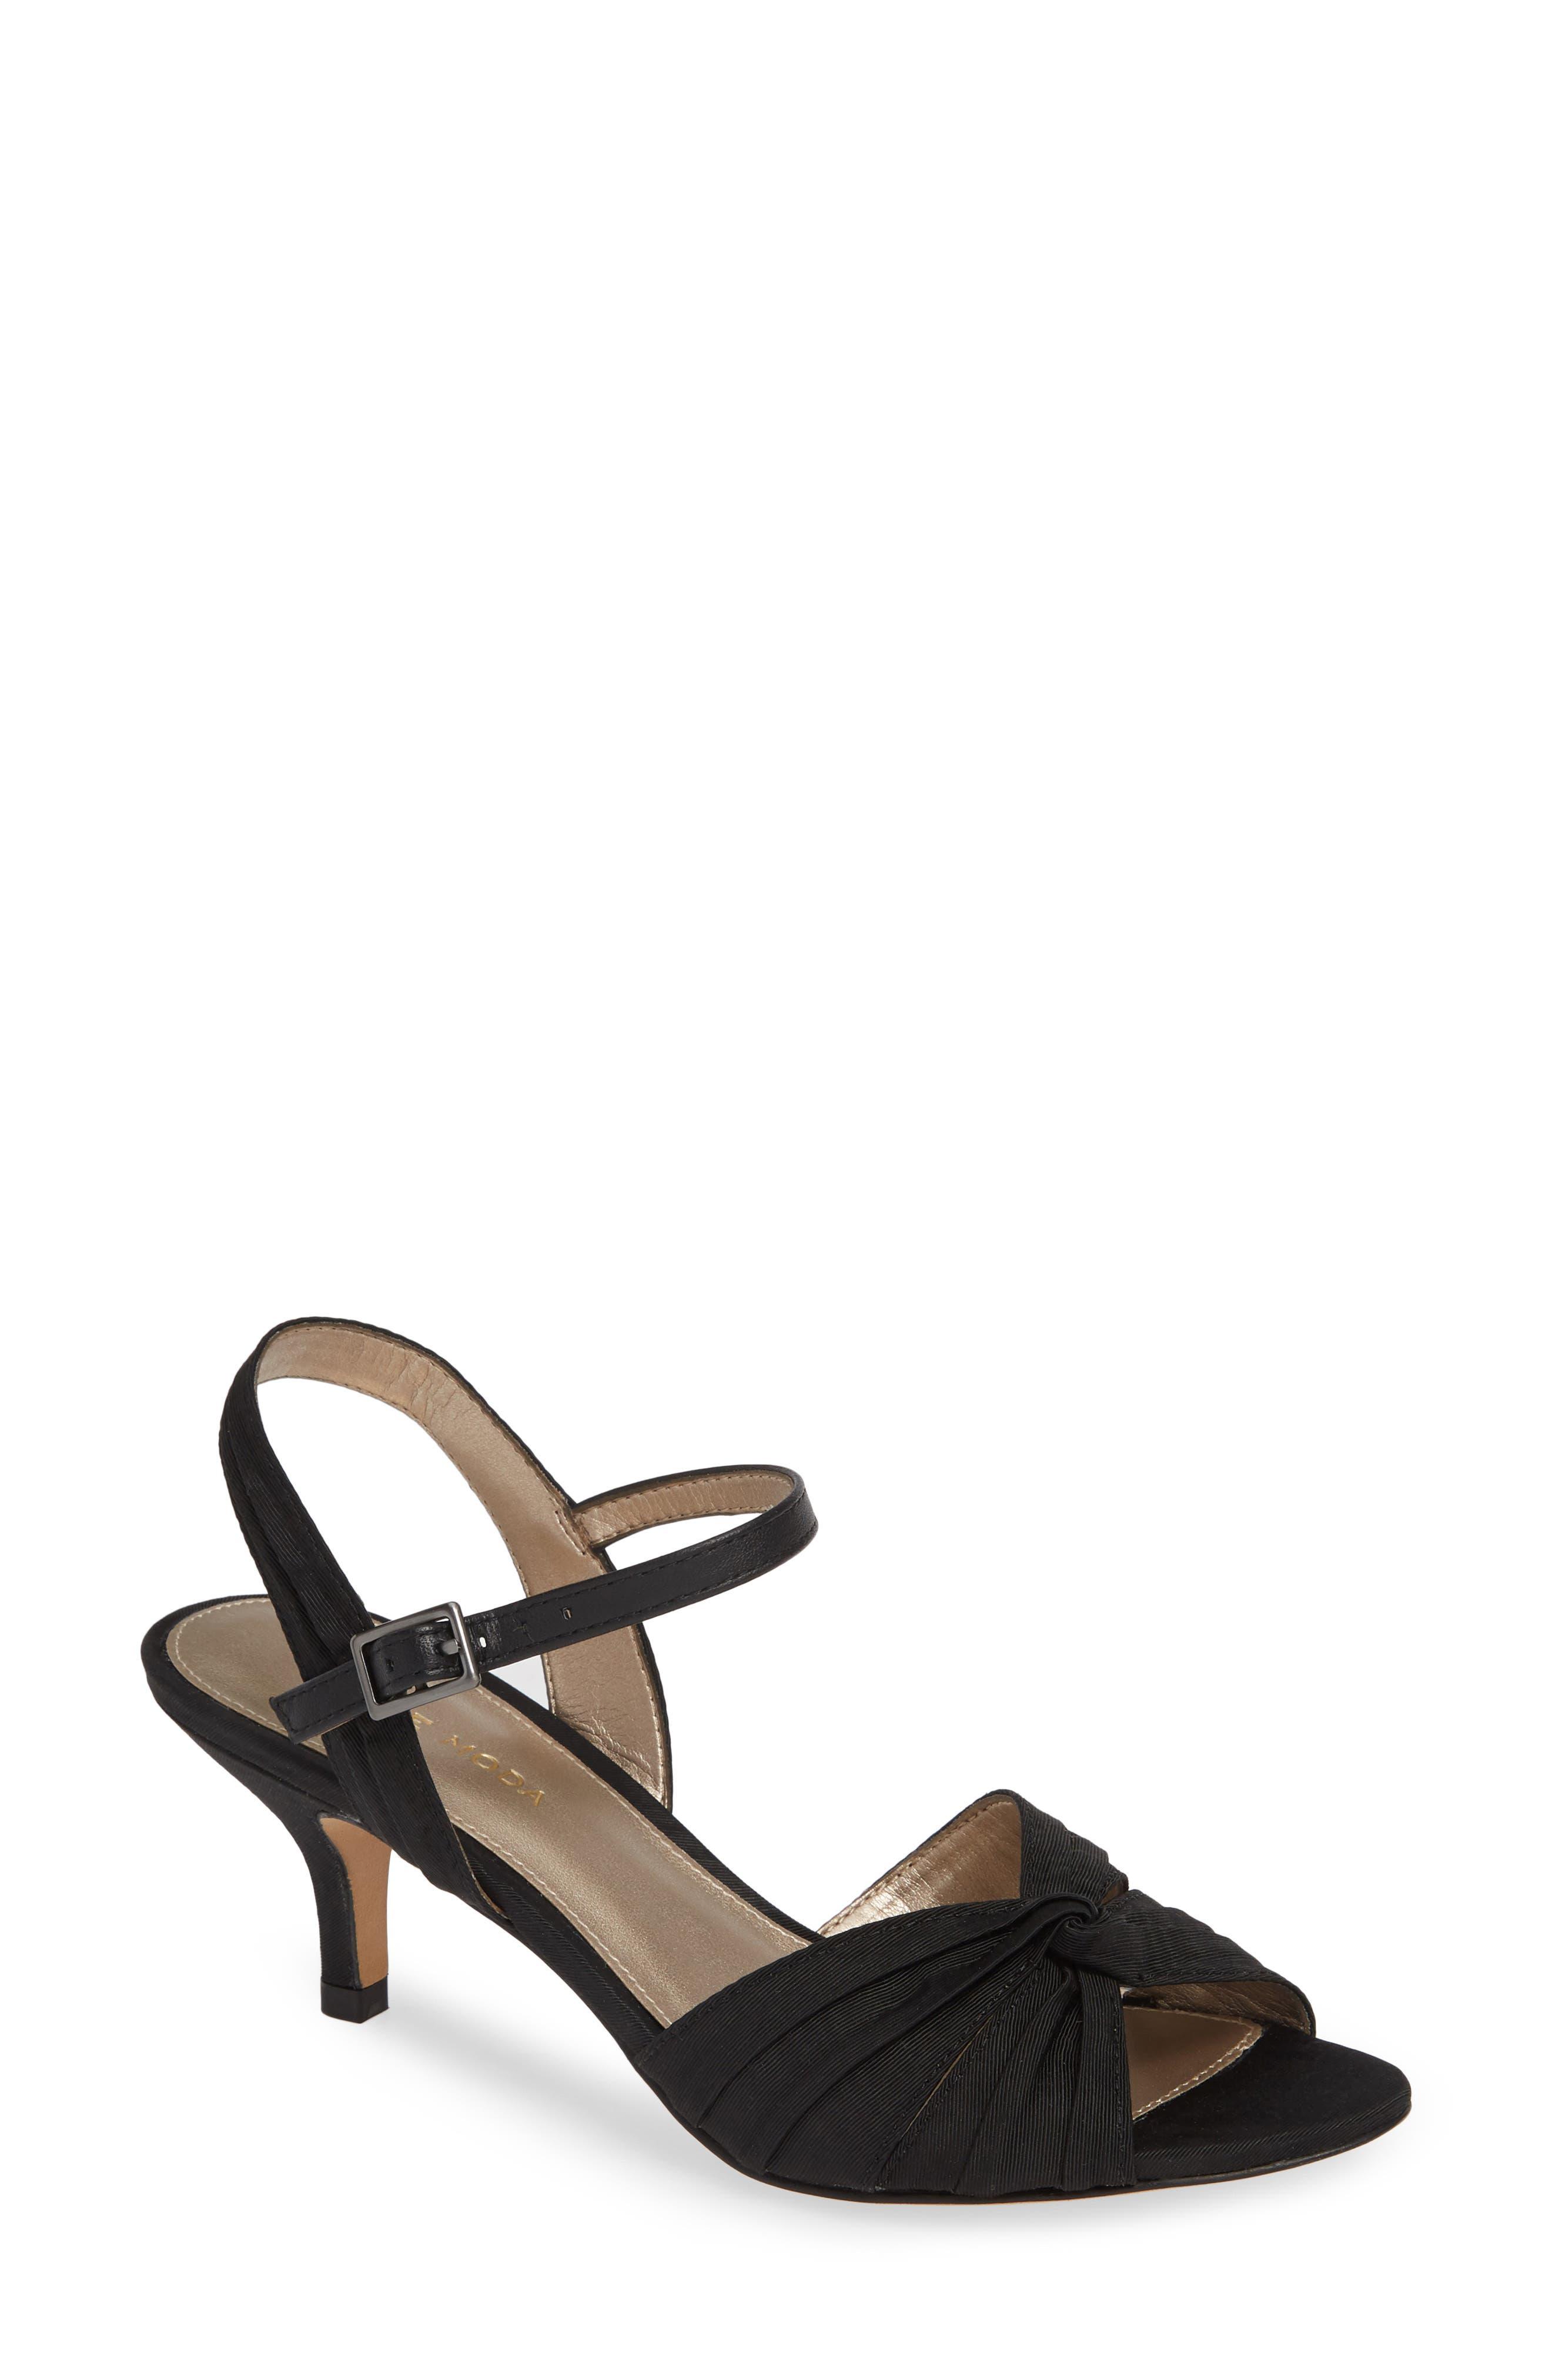 Pelle Moda Iliza Sandal- Black